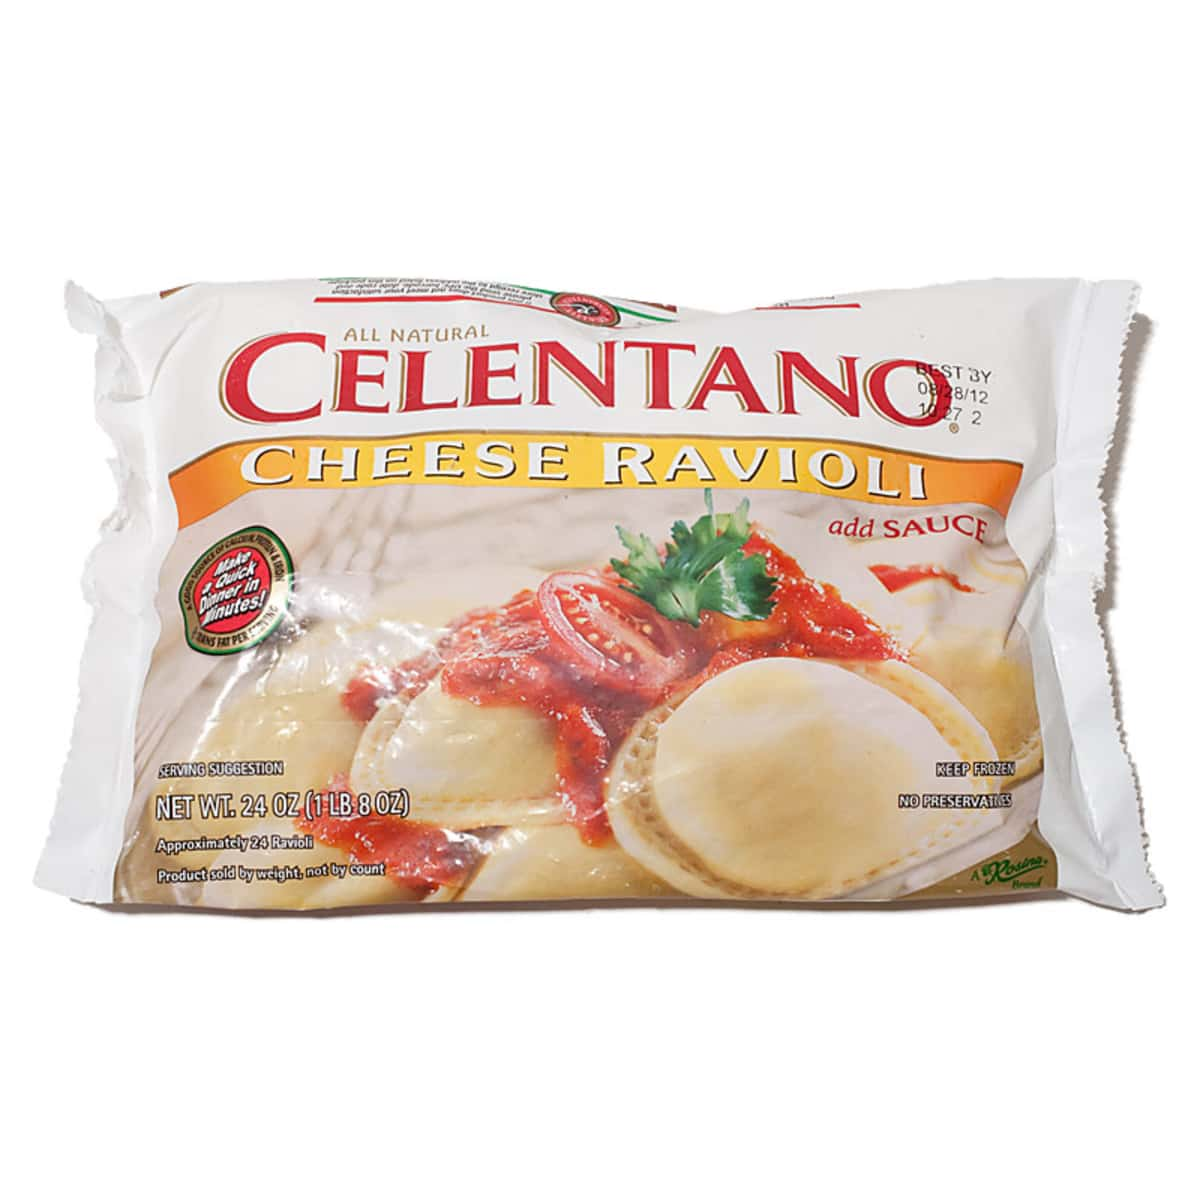 The Best Supermarket Cheese Ravioli Cooks Illustrated